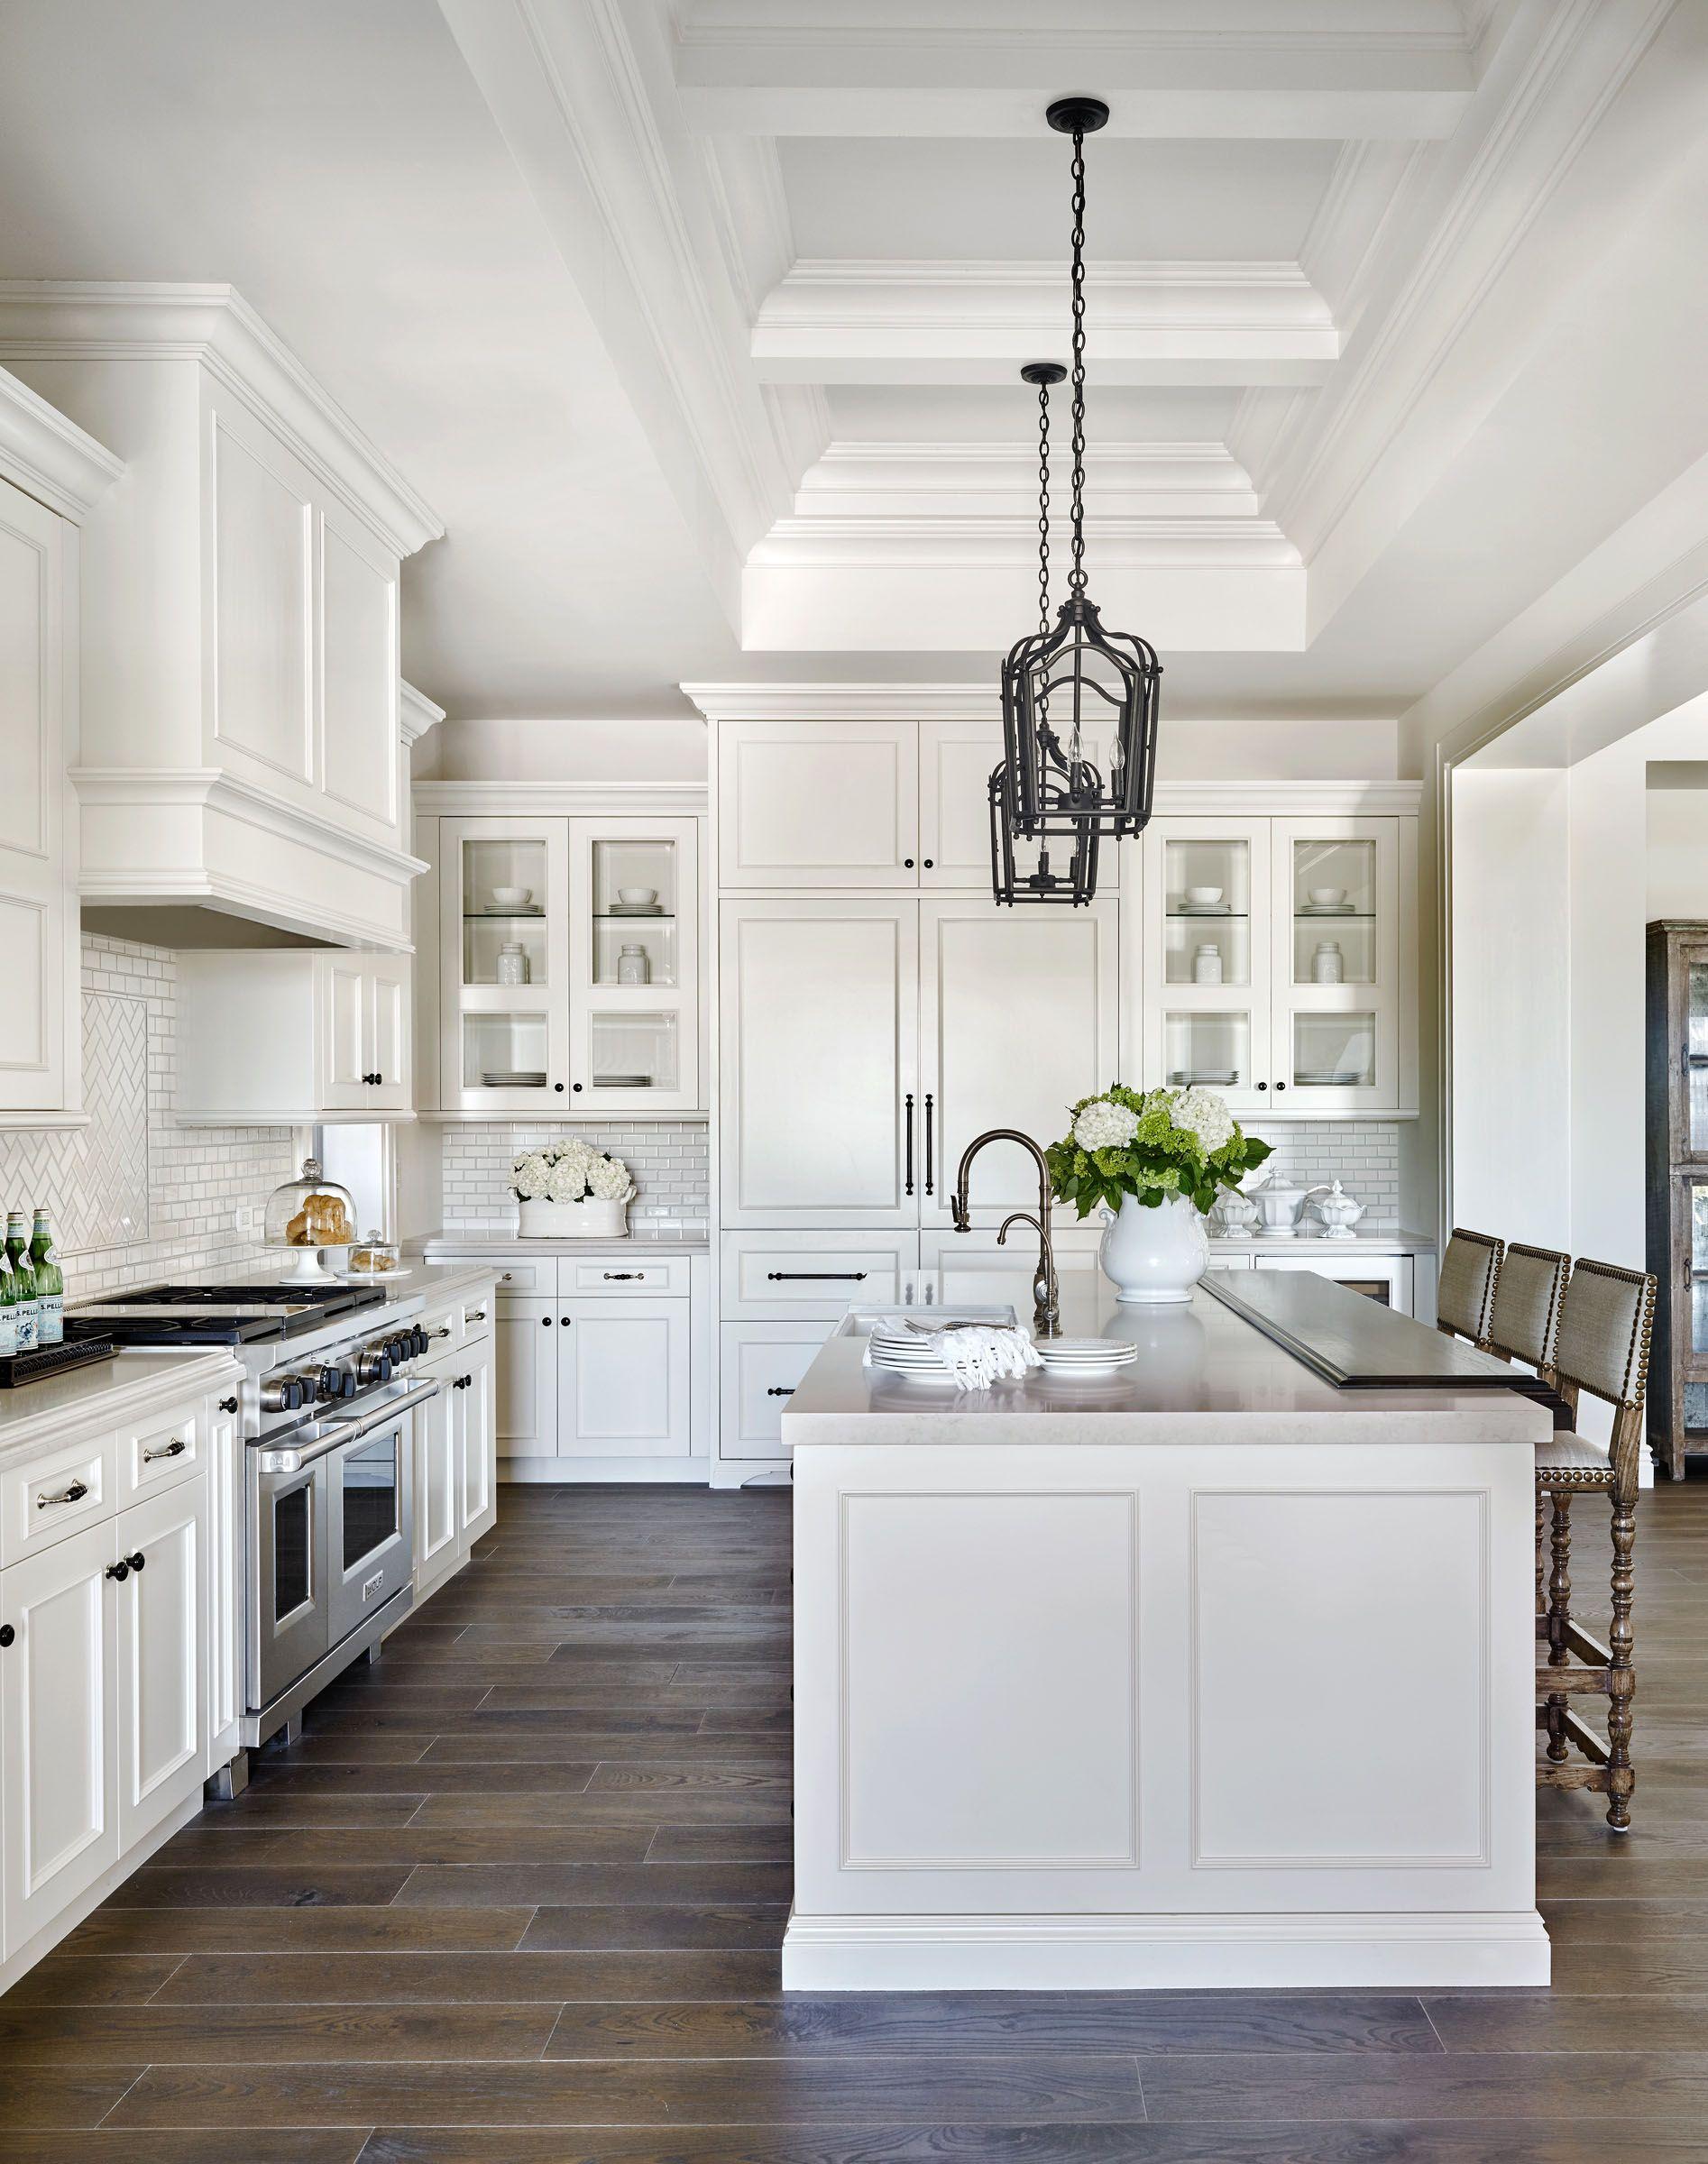 دکوراسیون آشپزخانه 17